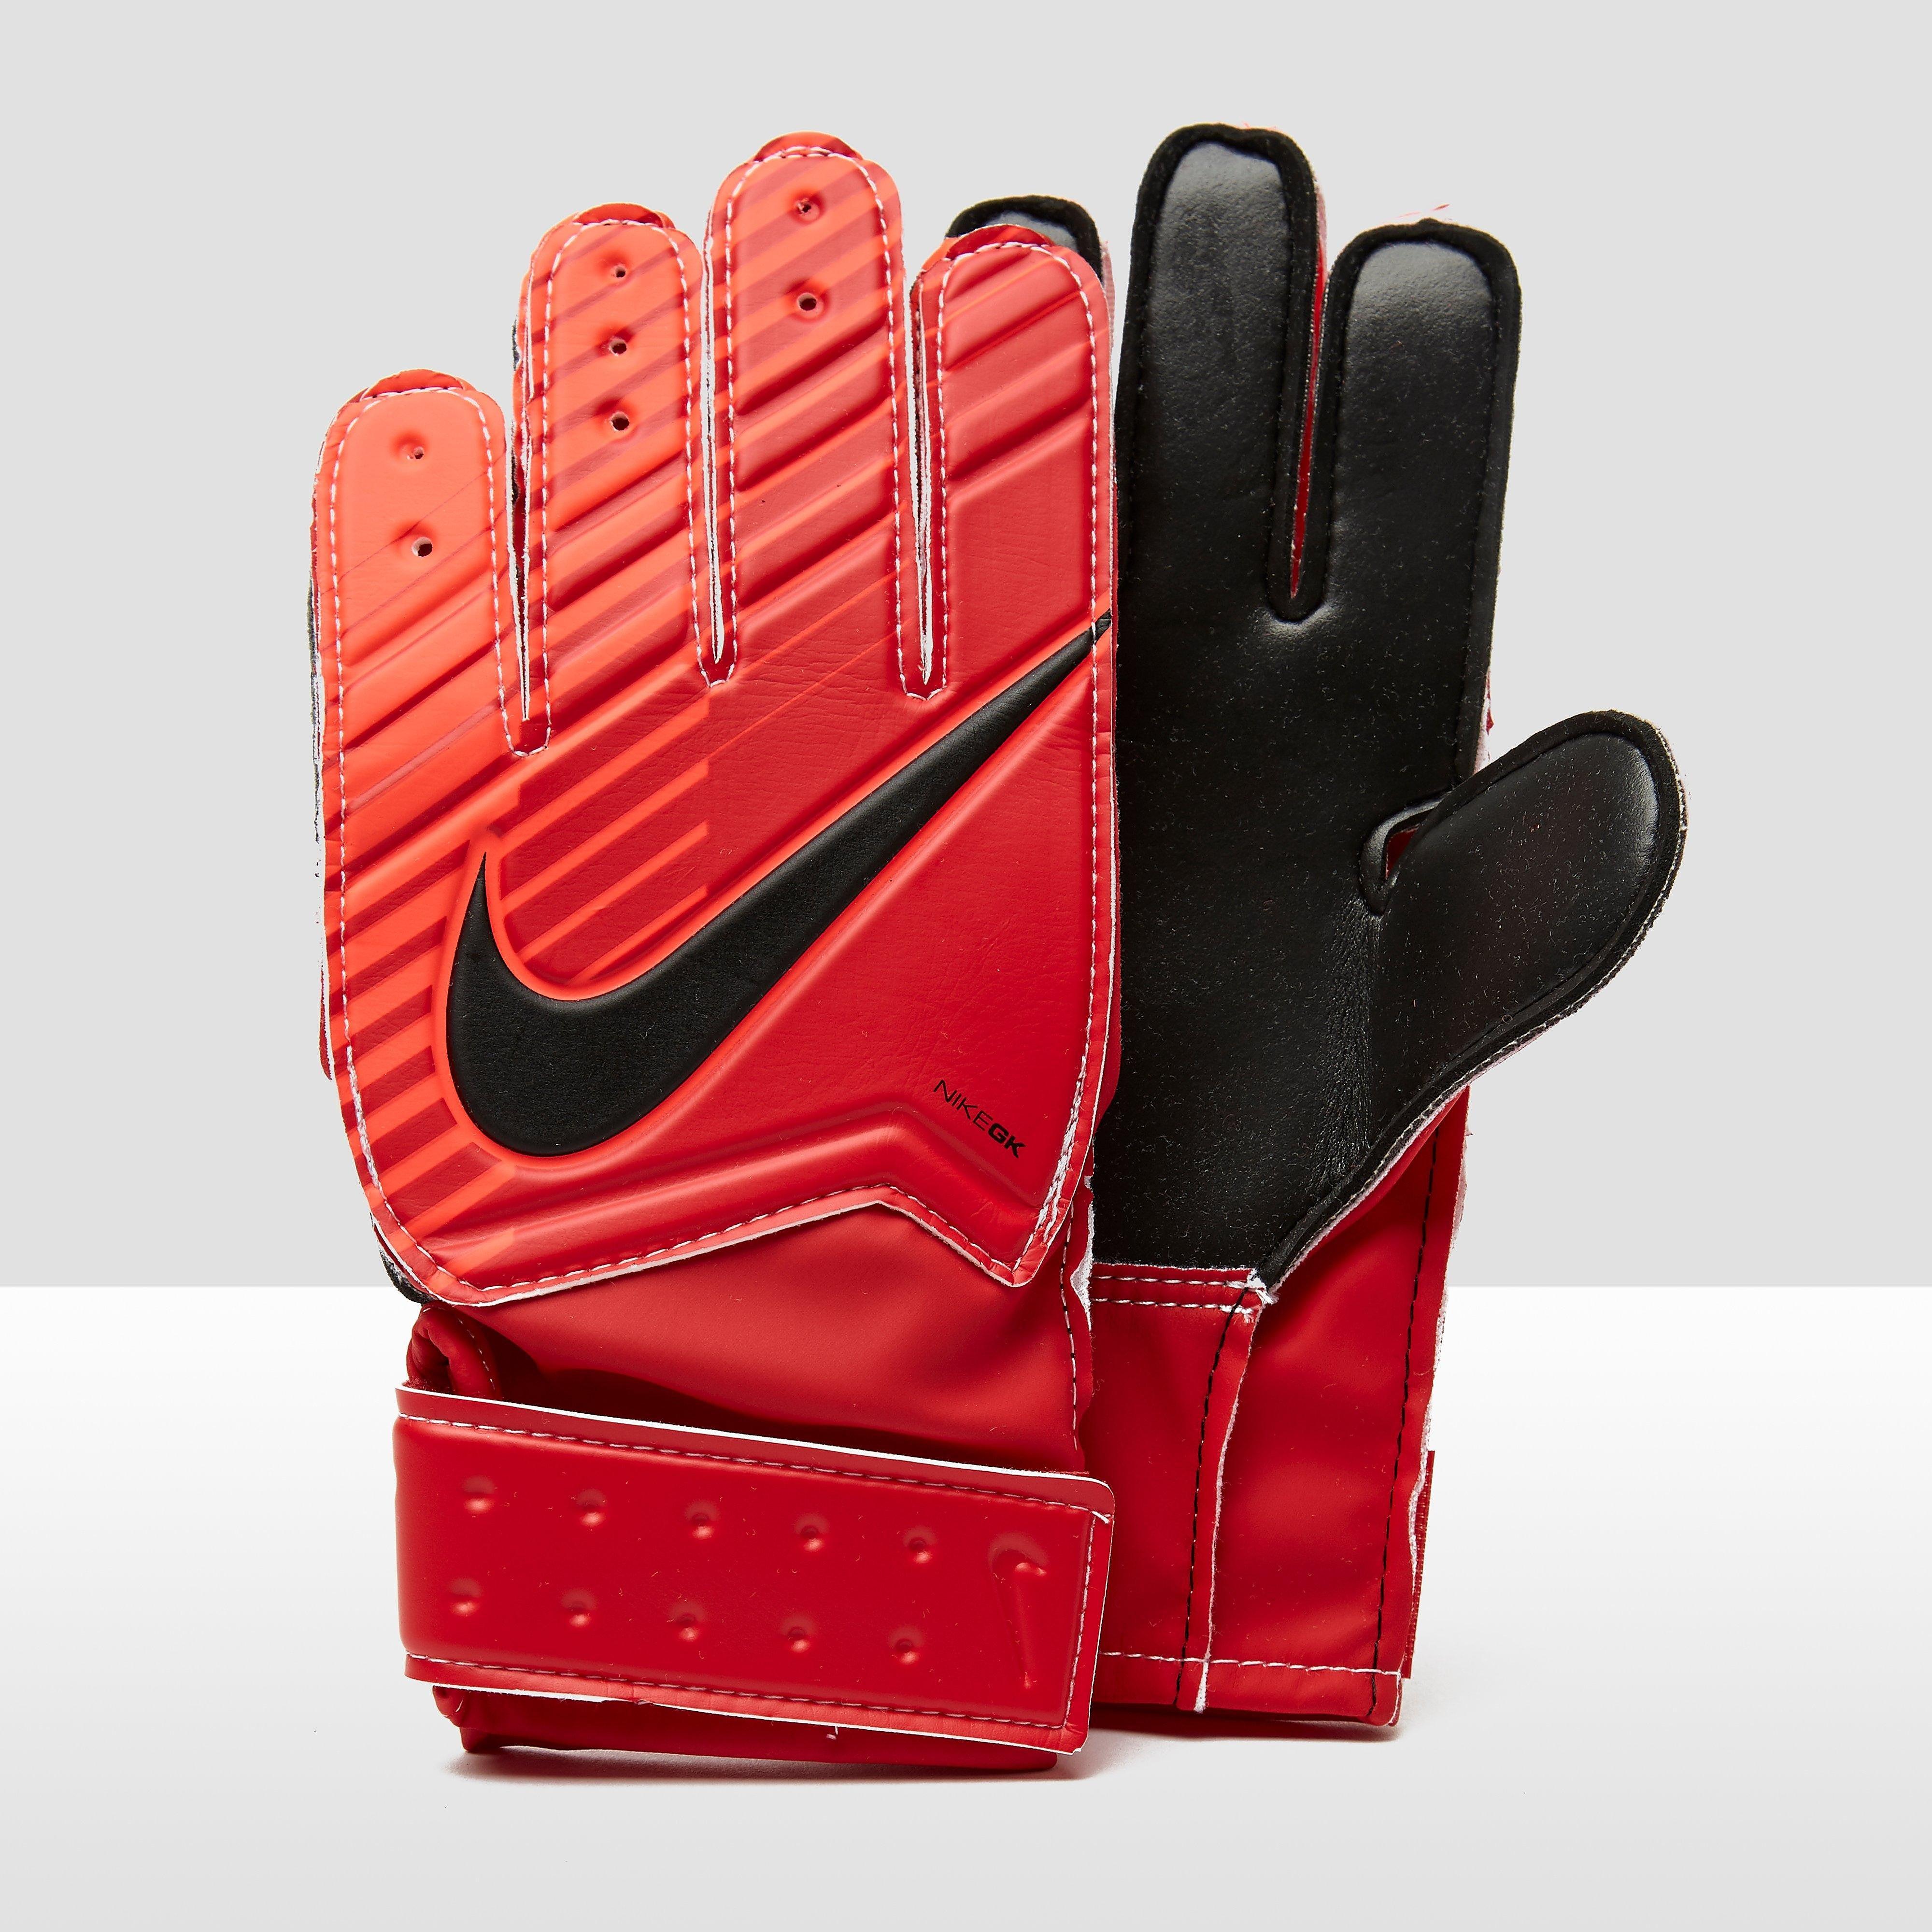 Match Keepershandschoenen Rood Kinderen. Size 7.0